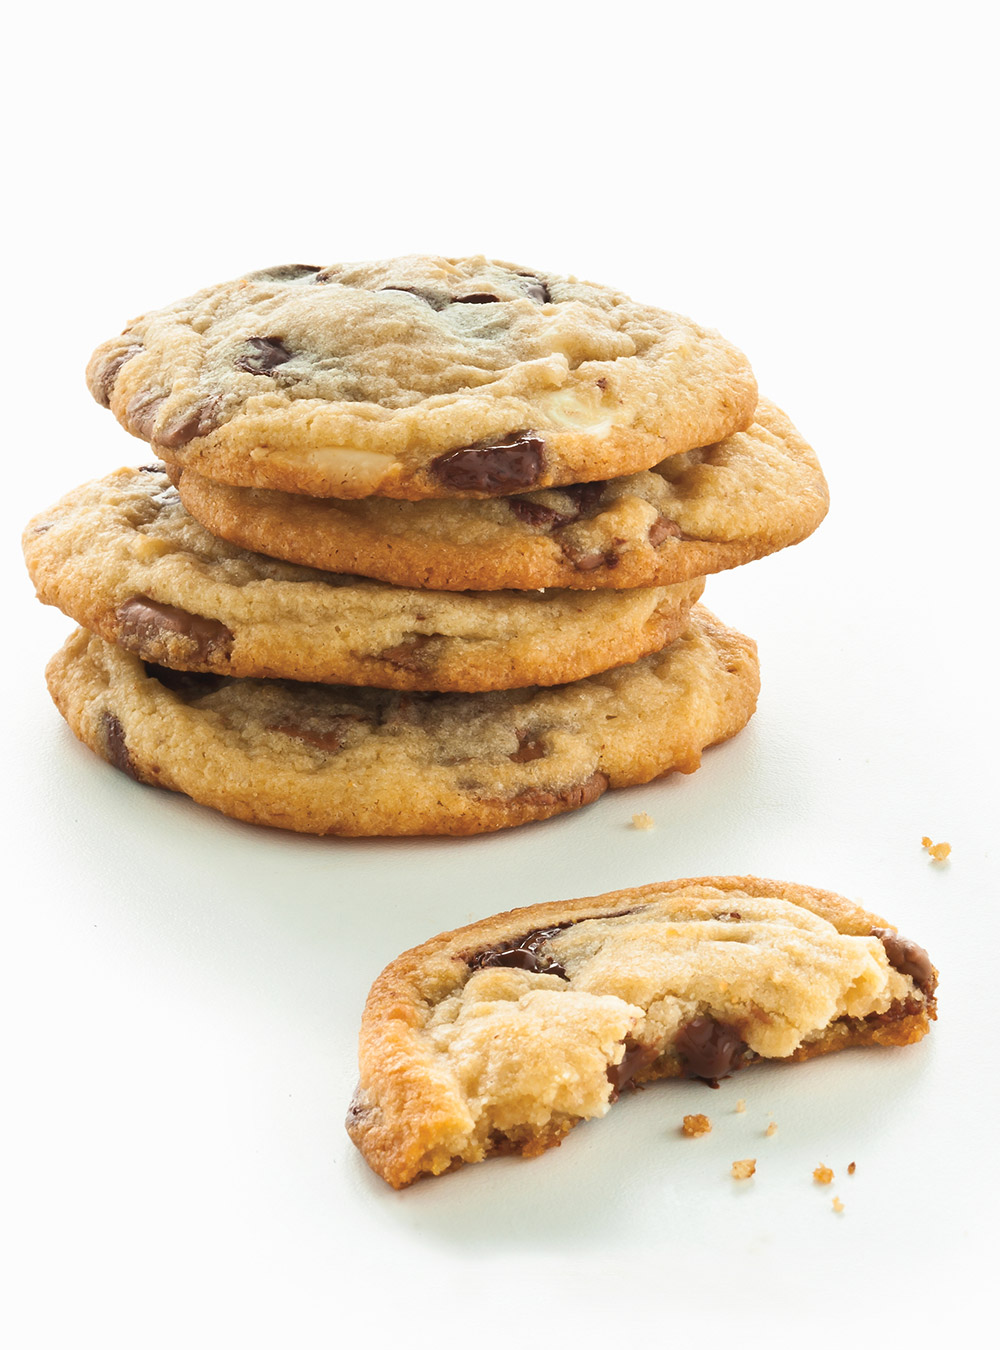 Biscuits tendres aux trois chocolats | ricardo